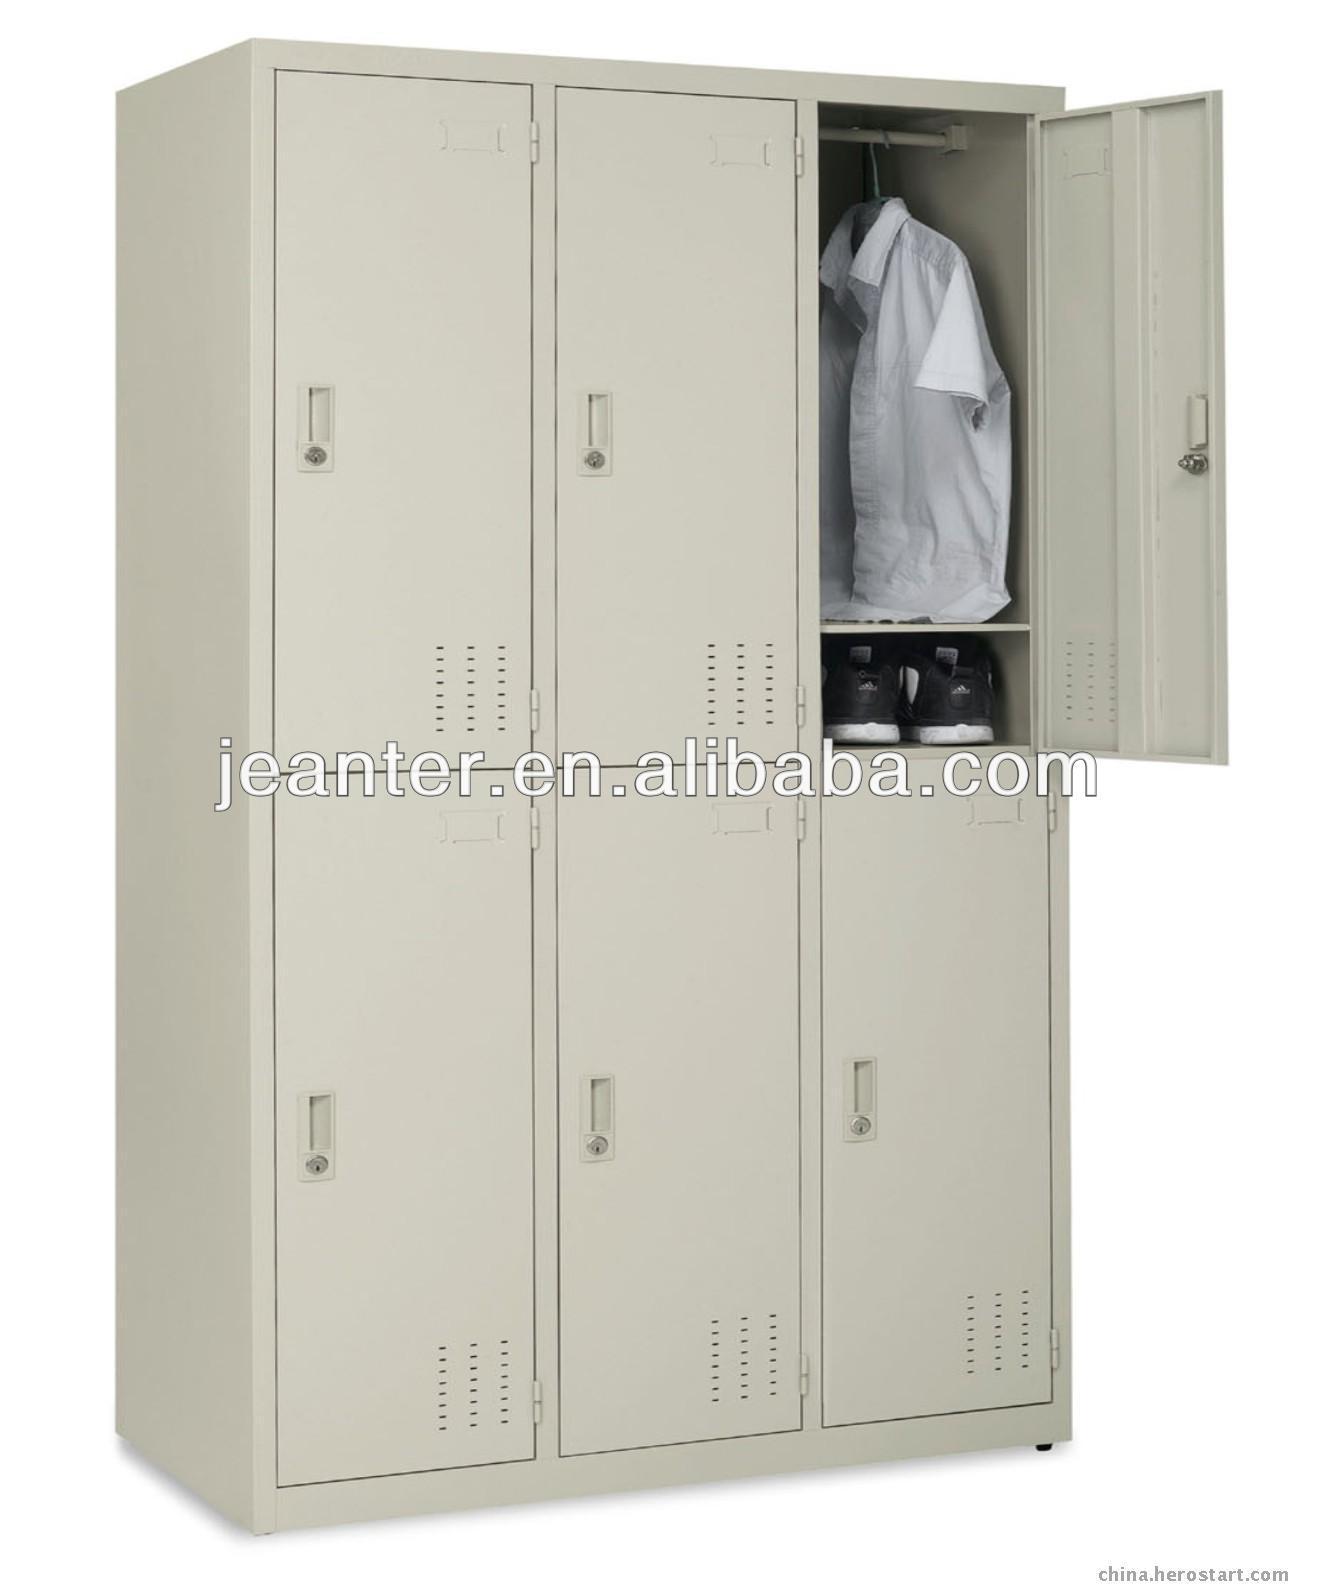 Wohnzimmerschrank Royal Oak Dormitory Metal Furniture 6 Doors Wardrobe Closet